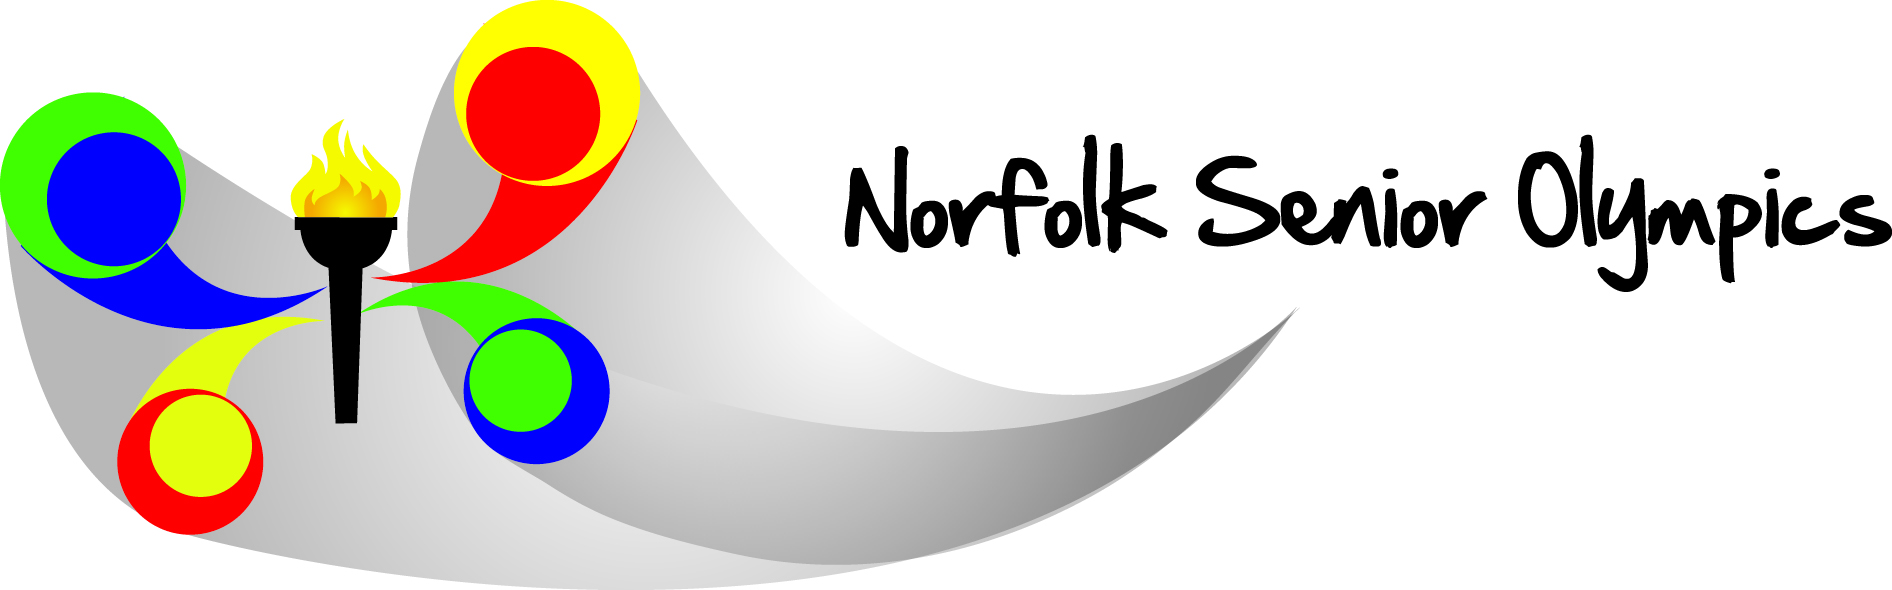 Norfolk Senior Olympics Logo.jpg